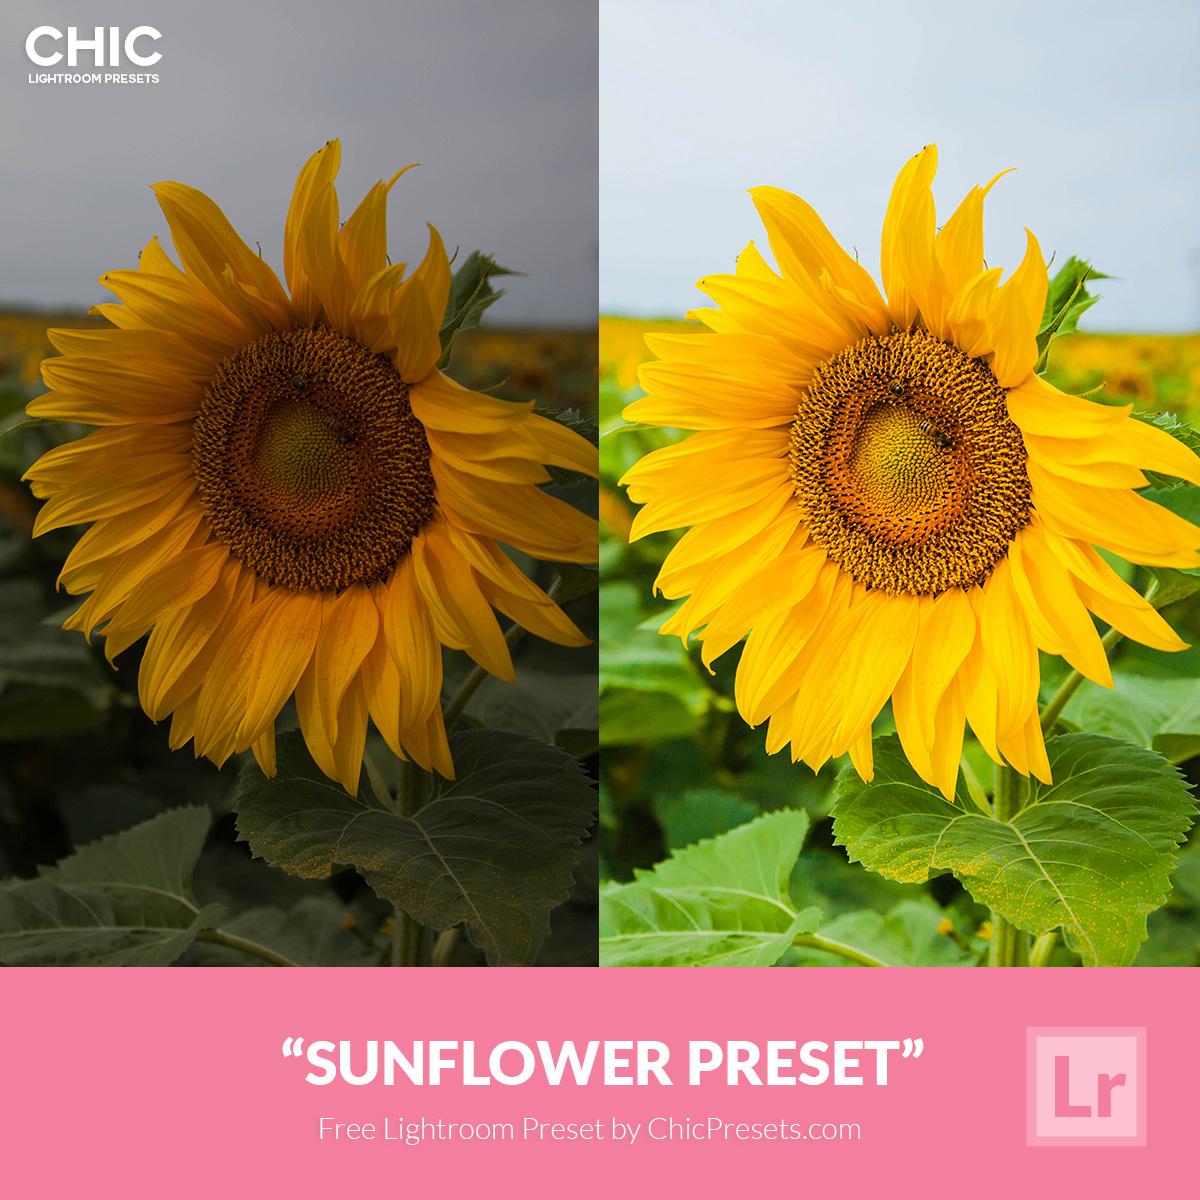 Free-Lightroom-Preset-Sunflower-